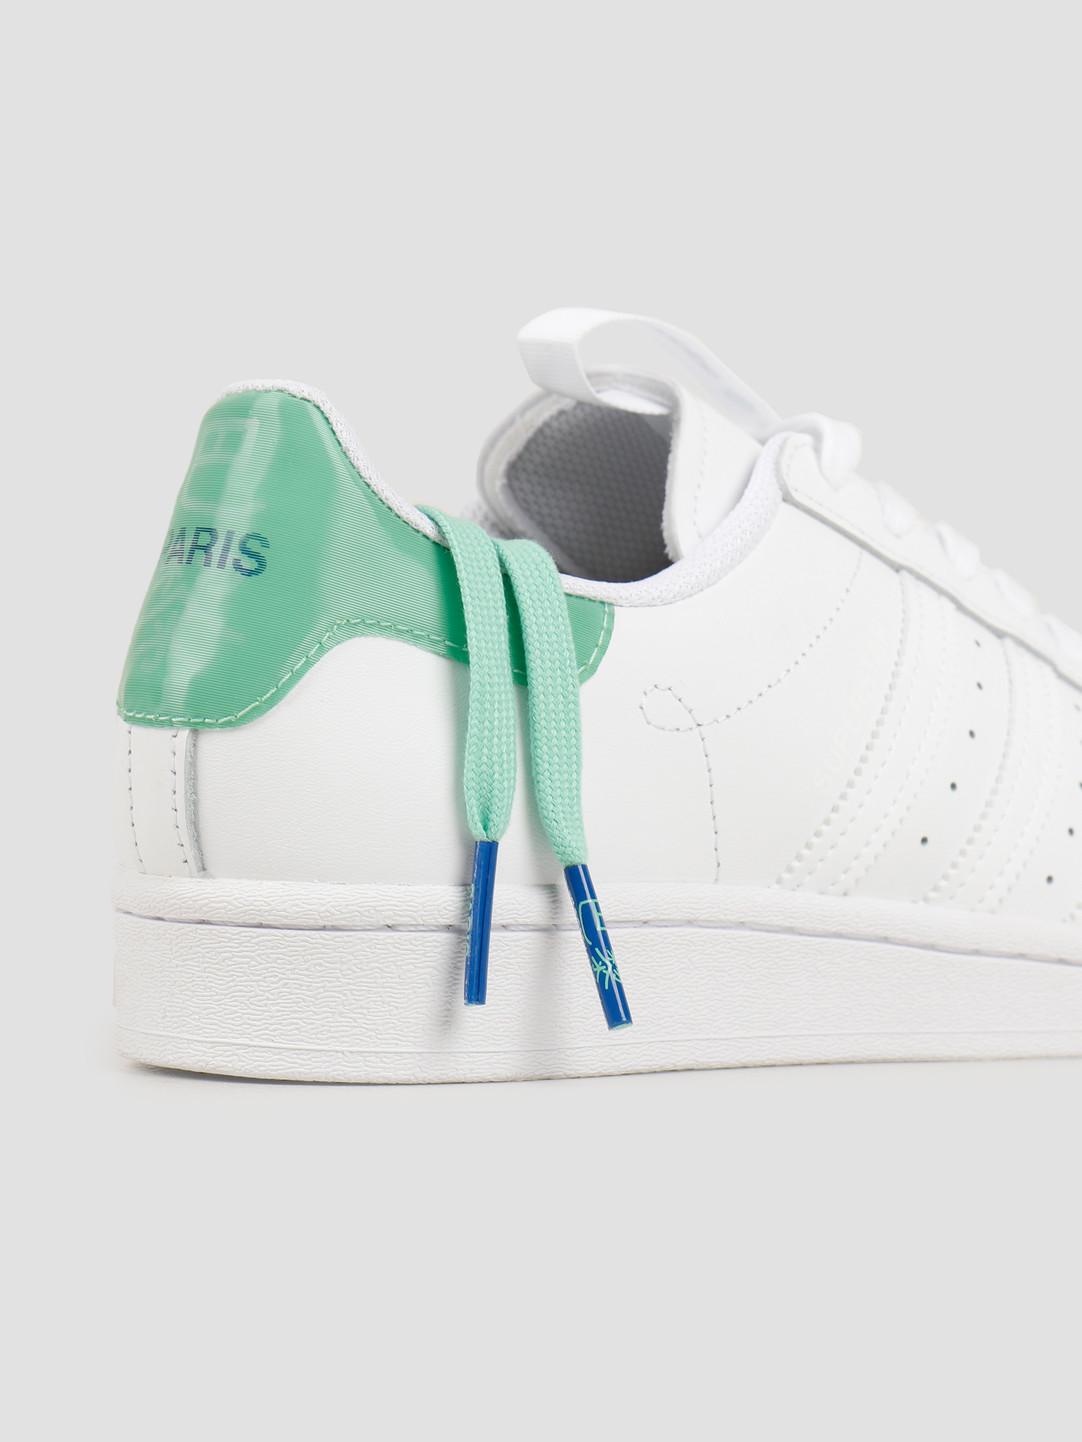 adidas adidas Superstar Footwear White Primin Core Royal FW2847